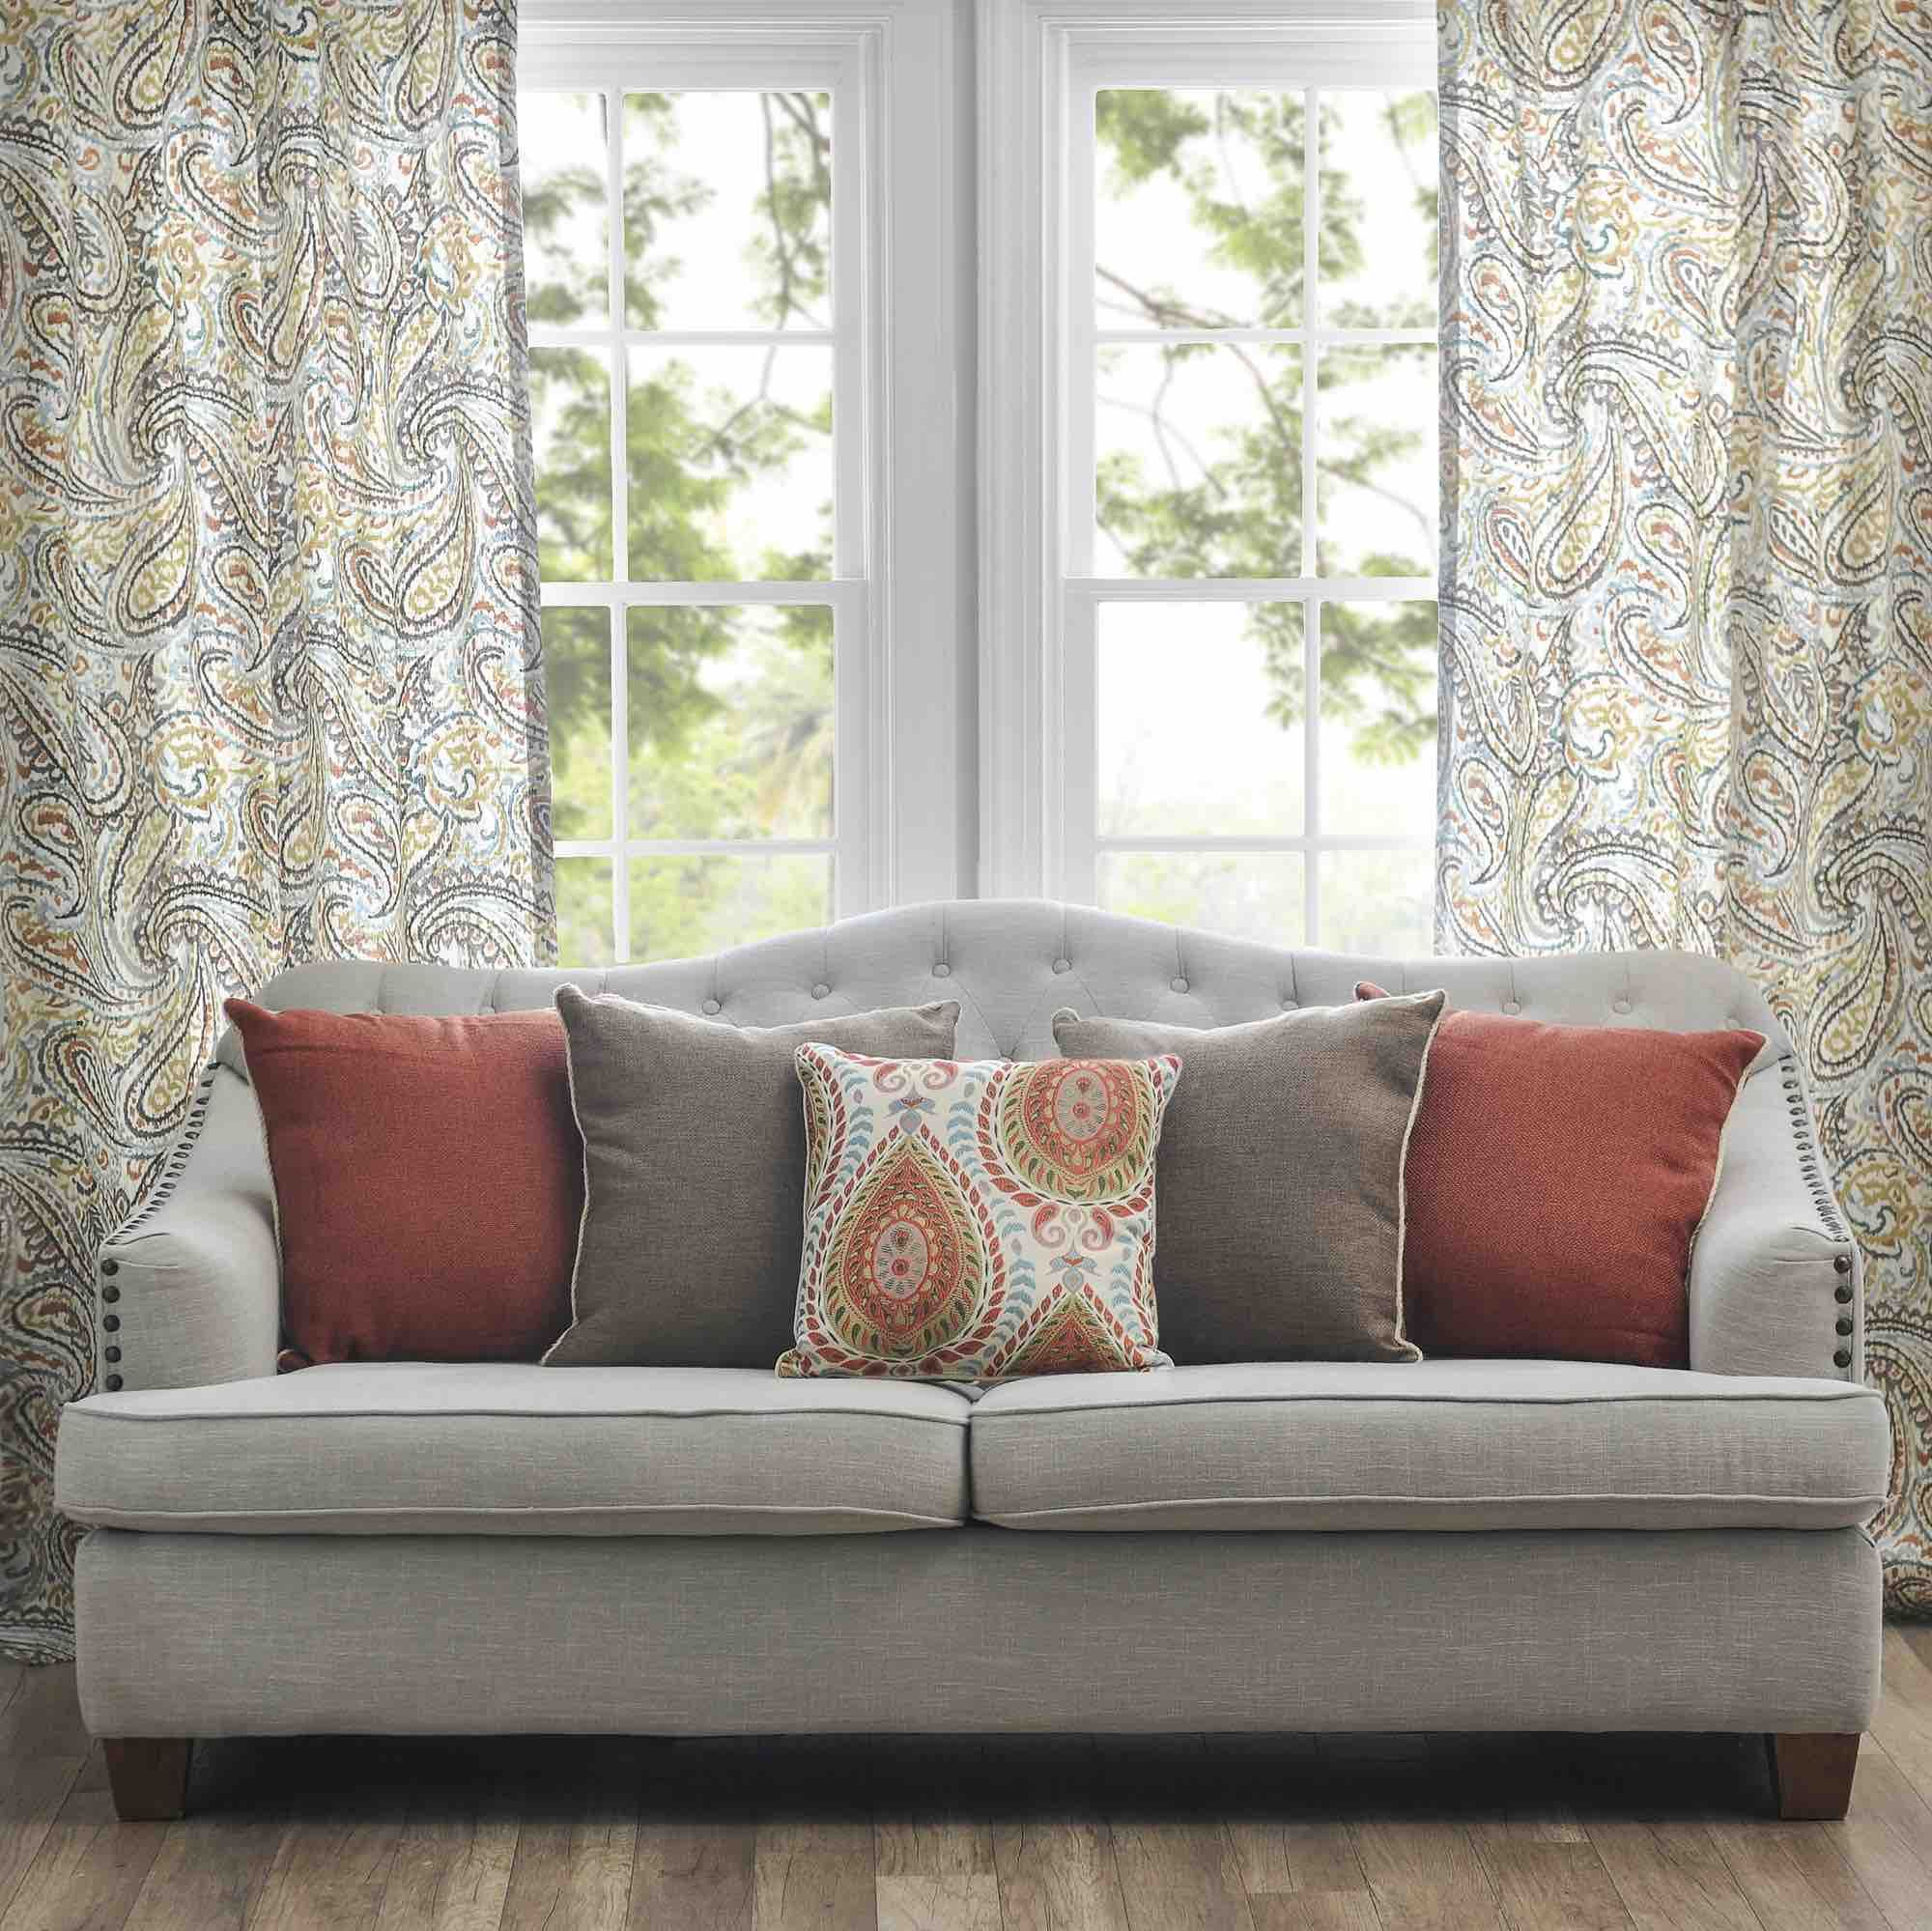 Divine Paisley Accent Pillow   Gorgeous pillows, Home ...